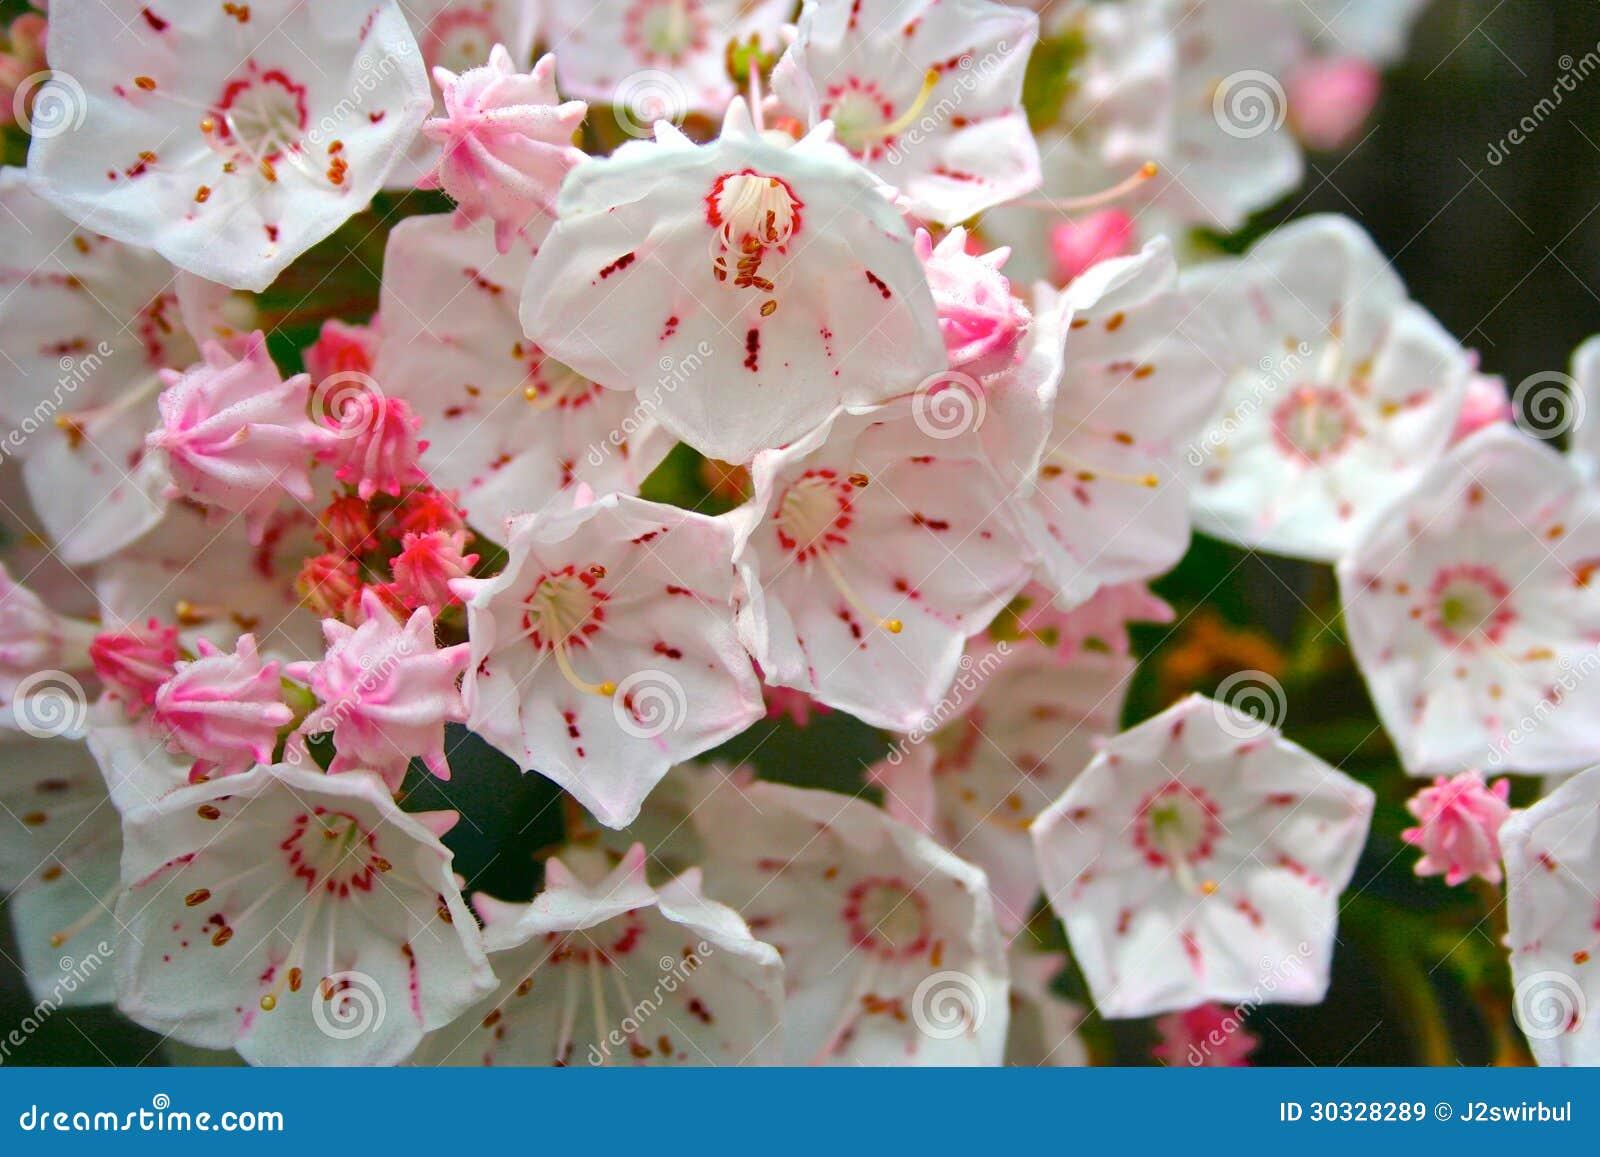 Download 山月桂 库存图片. 图片 包括有 月桂树, 粉红色, 女衬衫, 工厂, 常青树, 自然, 水平, 绽放, 楼层 - 30328289